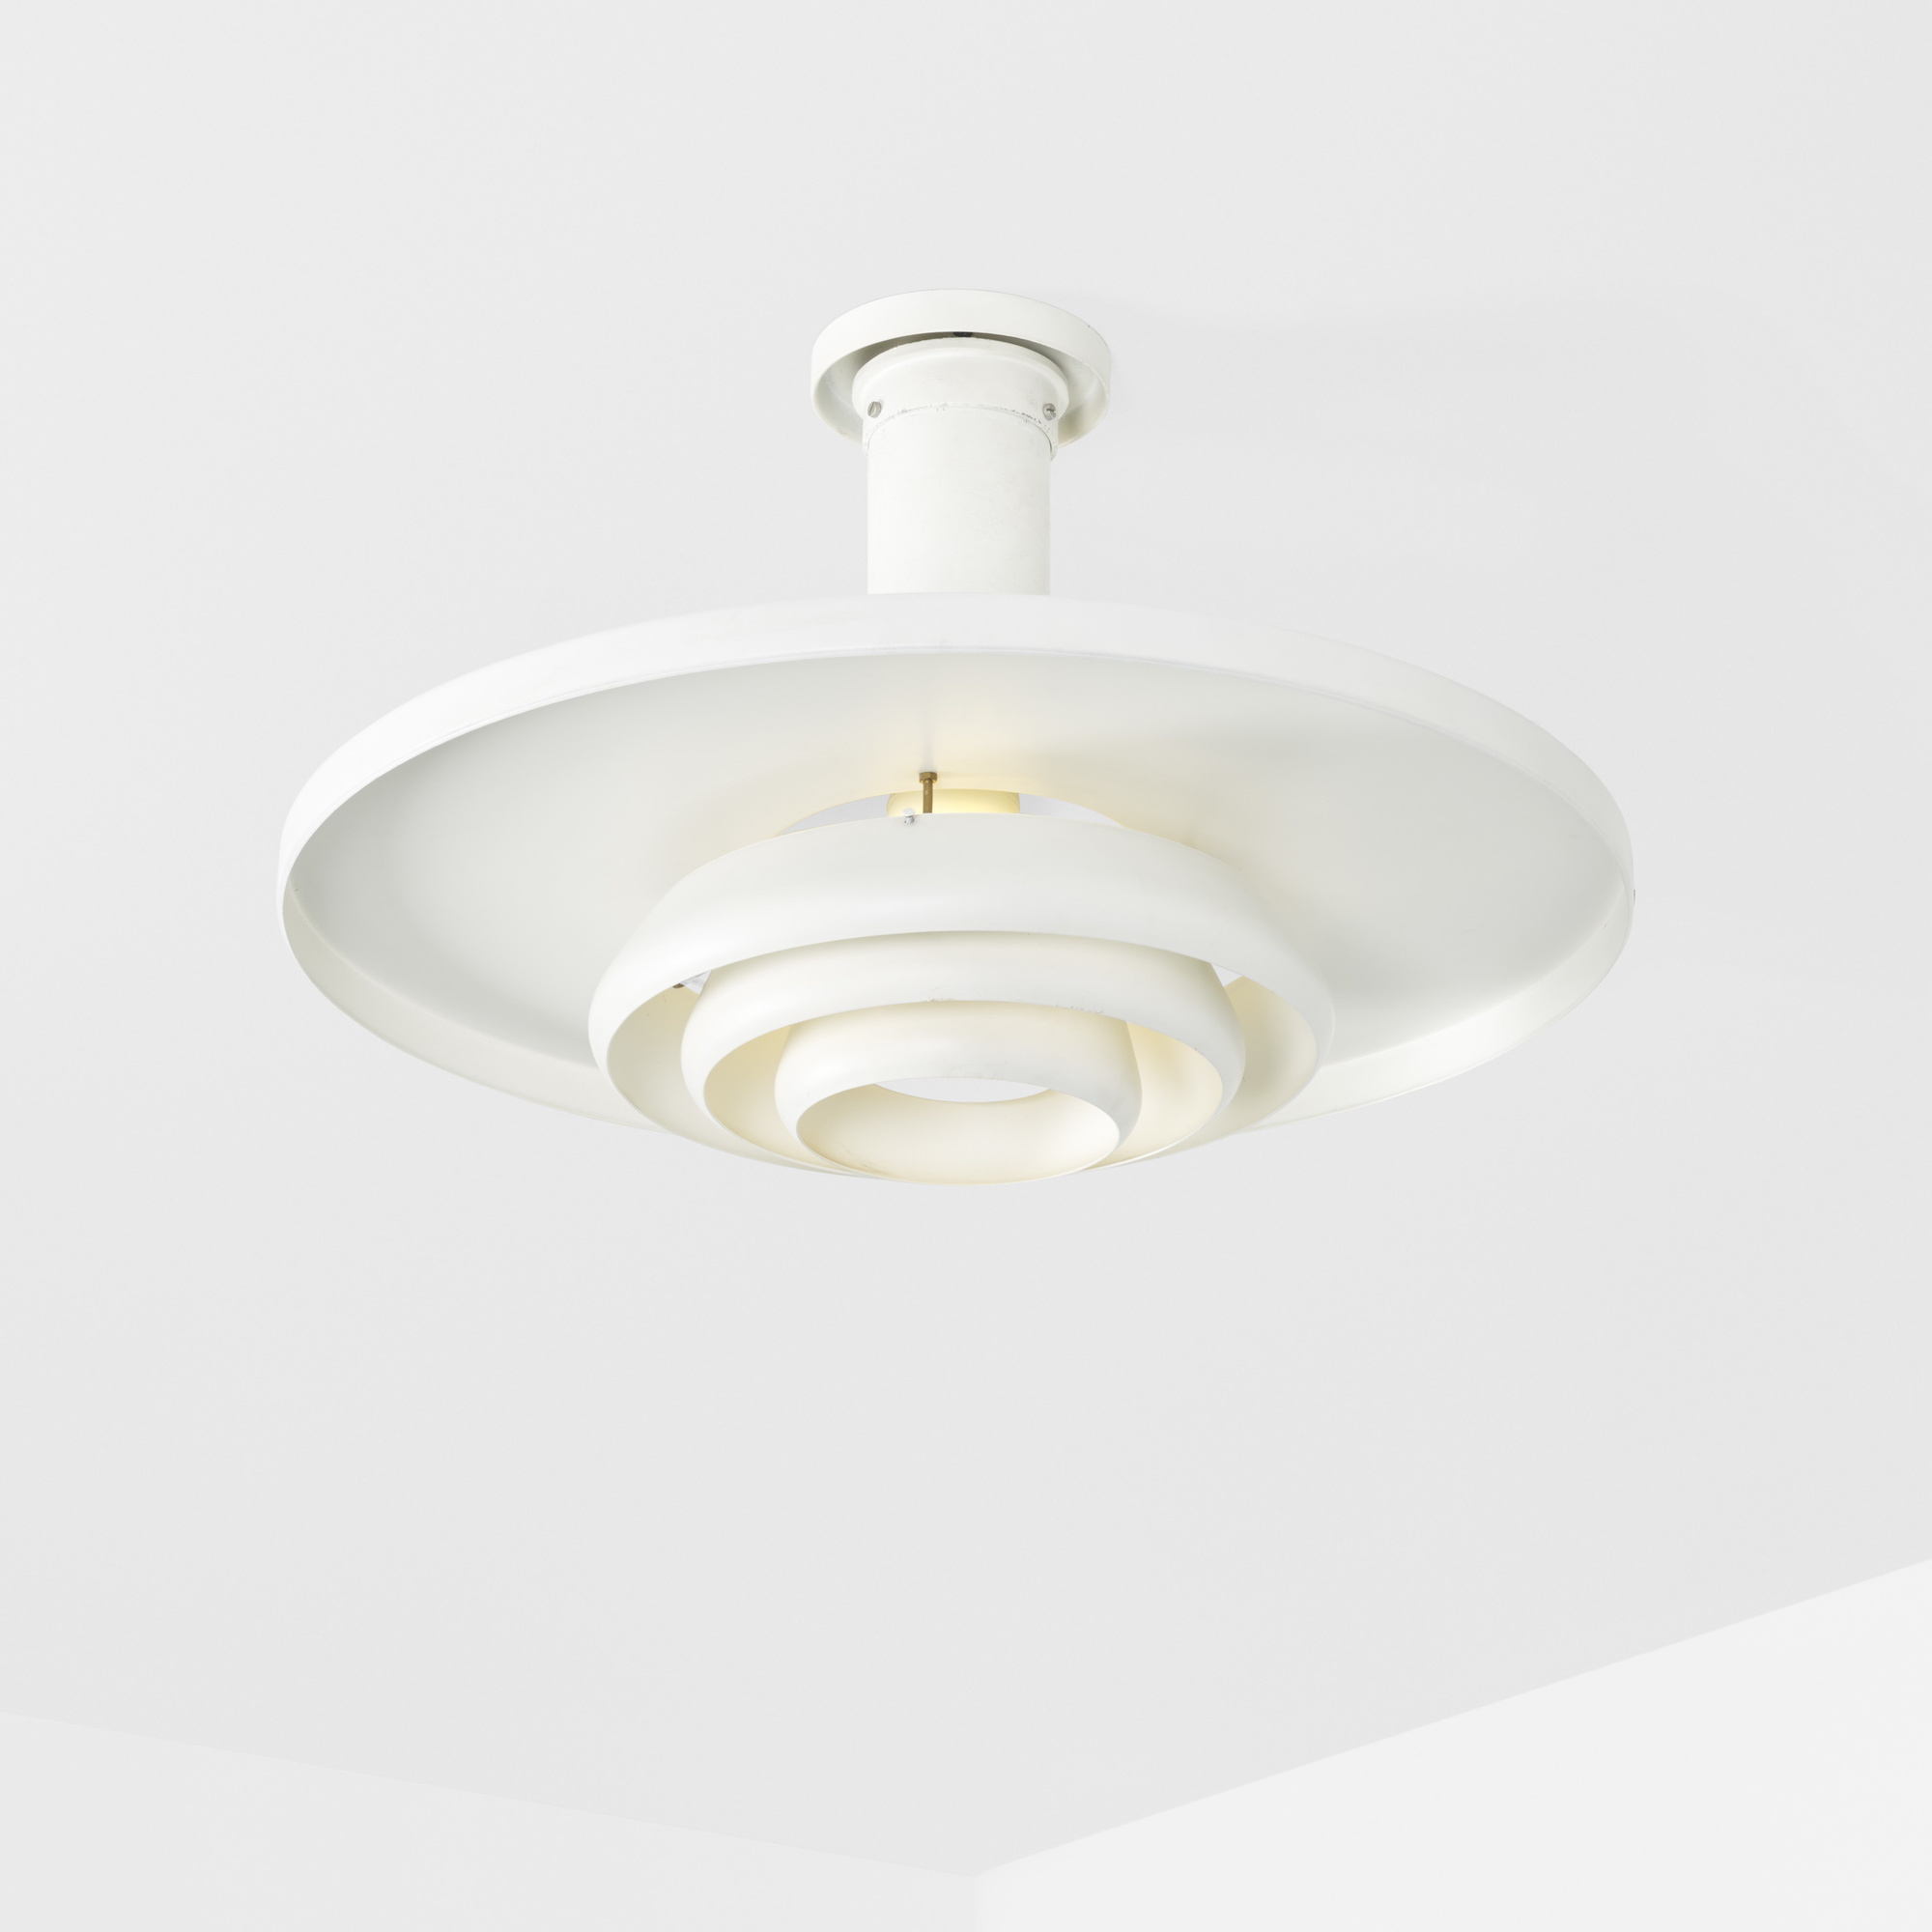 181 alvar aalto flying saucer ceiling lamp model a337 181 alvar aalto flying saucer ceiling lamp model a337 1 of 2 arubaitofo Gallery